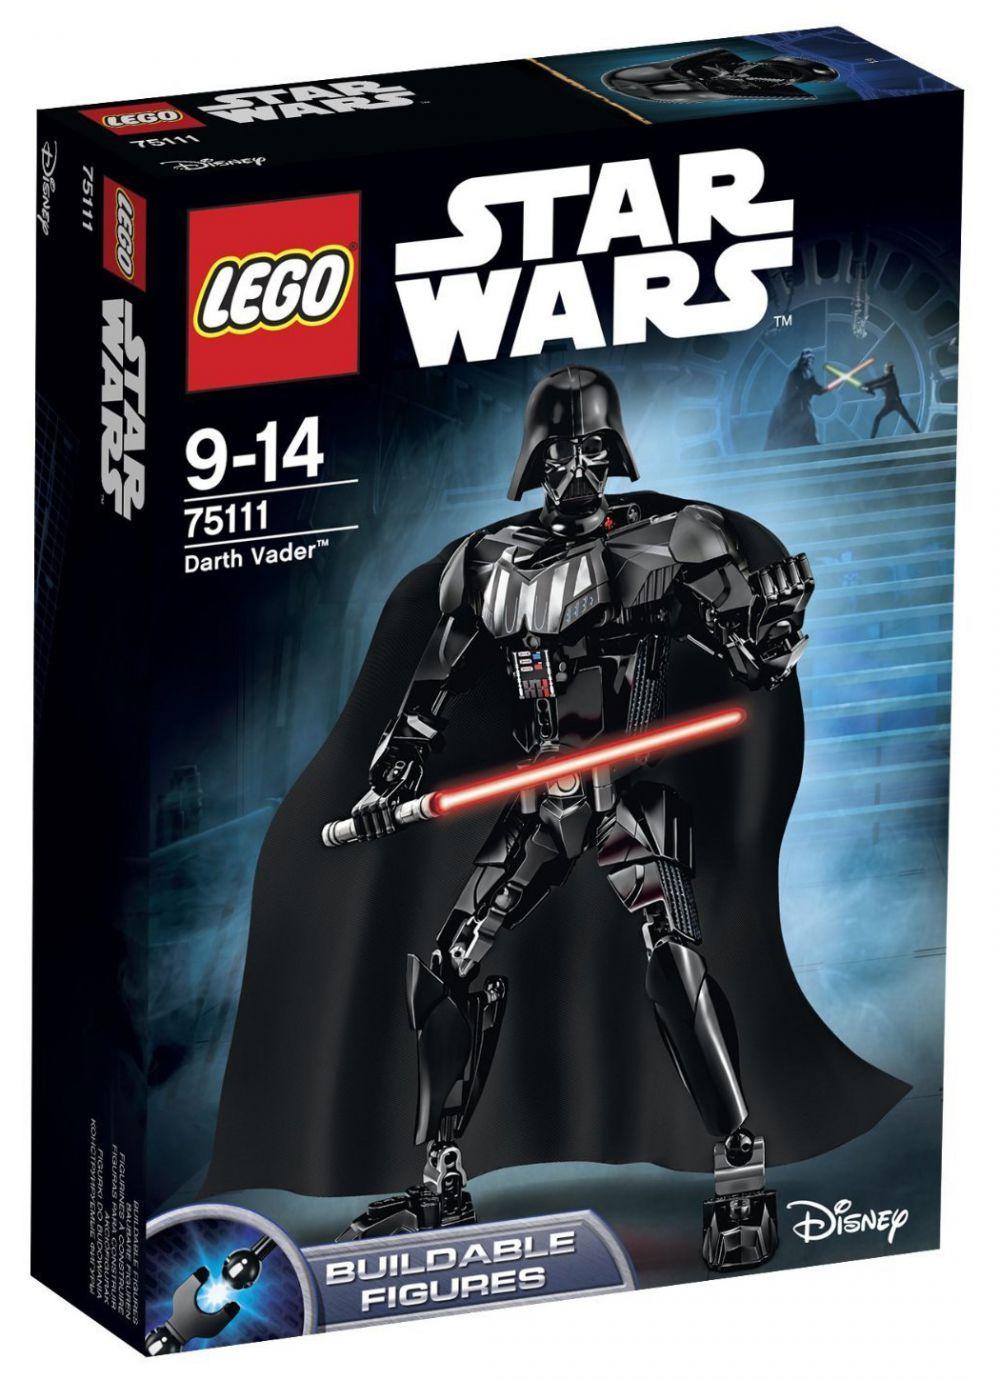 Wars Dark Vador 75111 Star Lego w0nmvN8